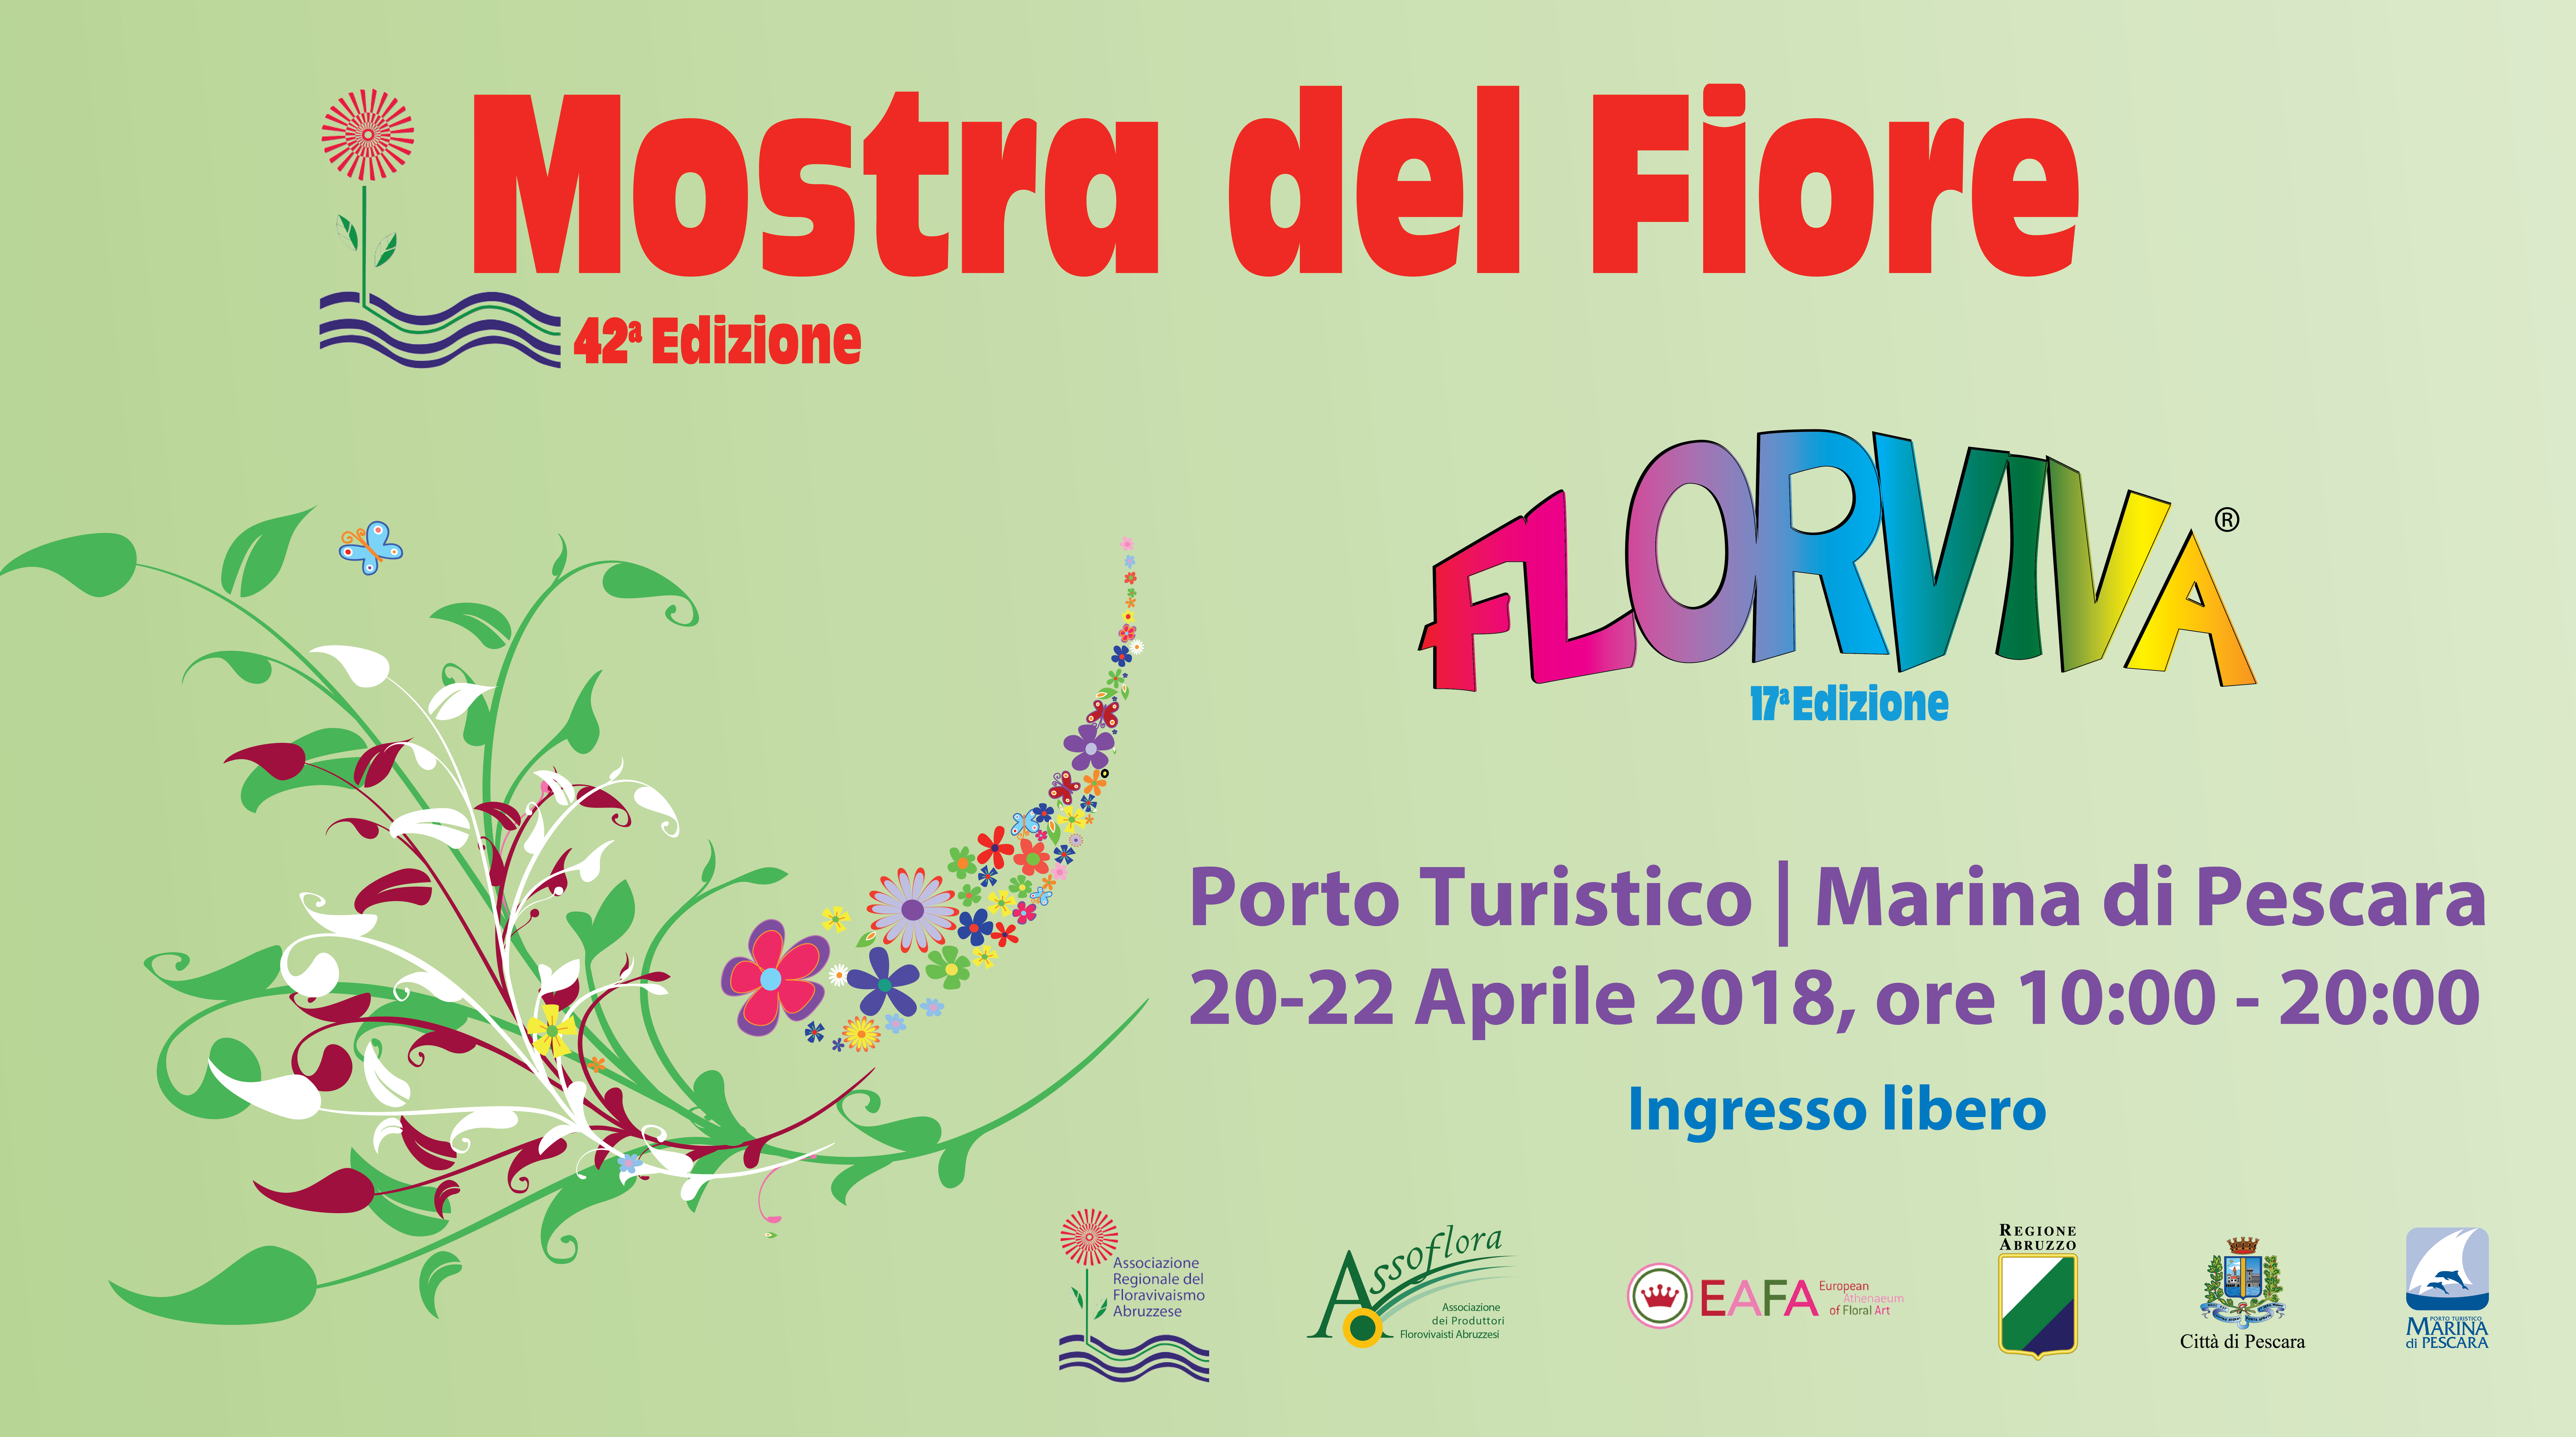 Mostra del Fiore Florviva 2018